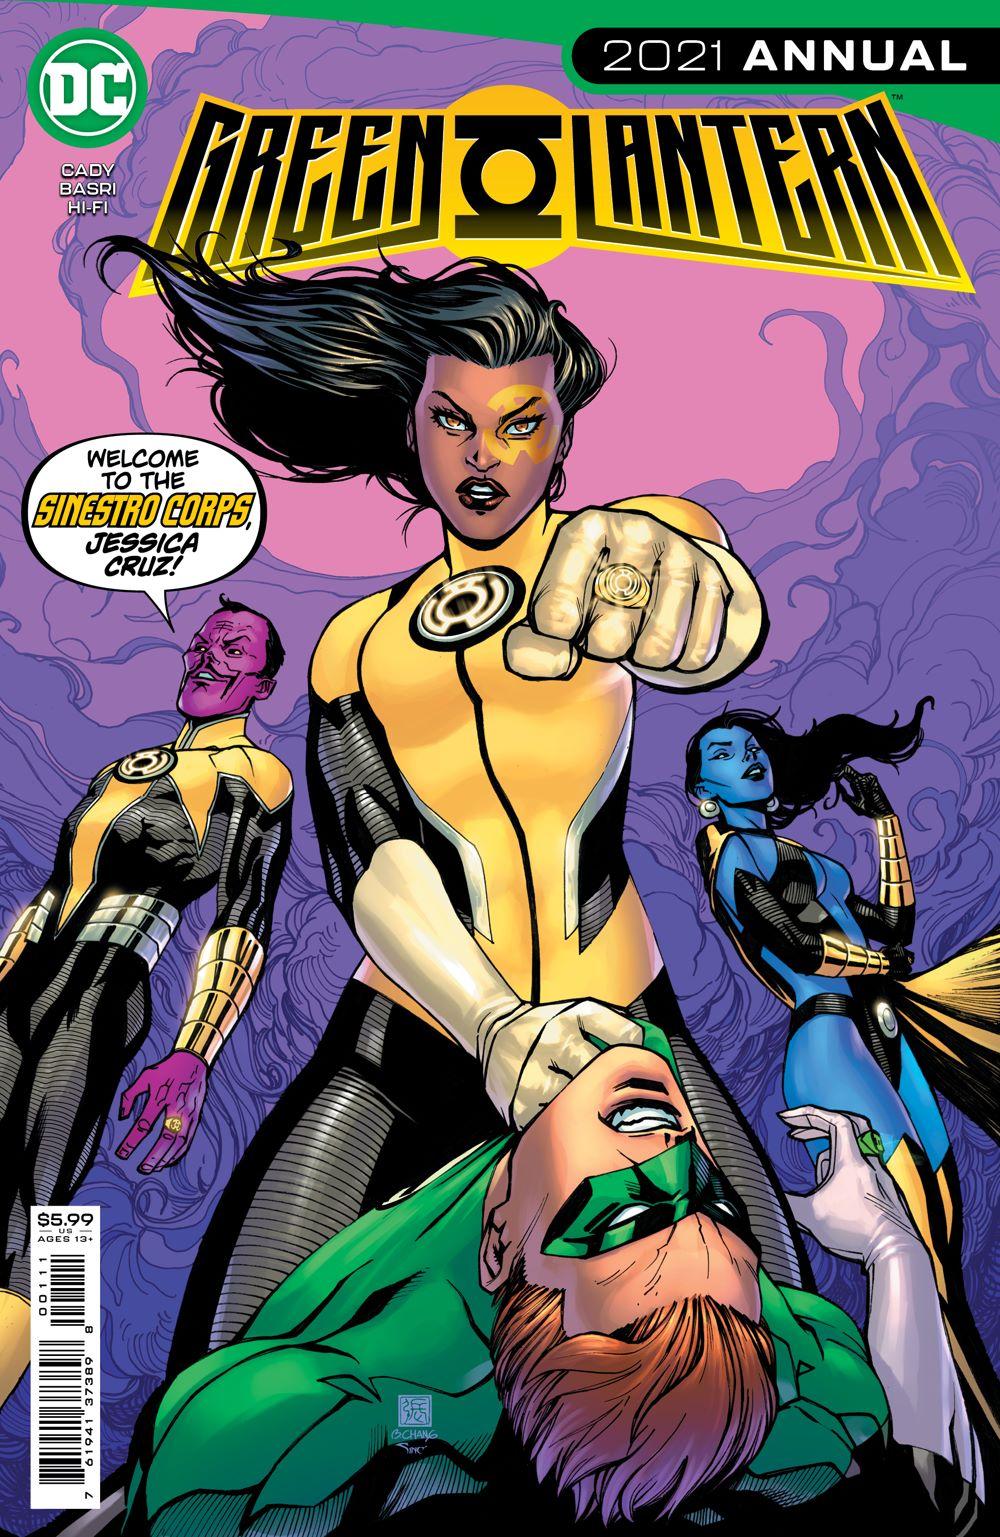 GLANN2021_Cv1 DC Comics August 2021 Solicitations